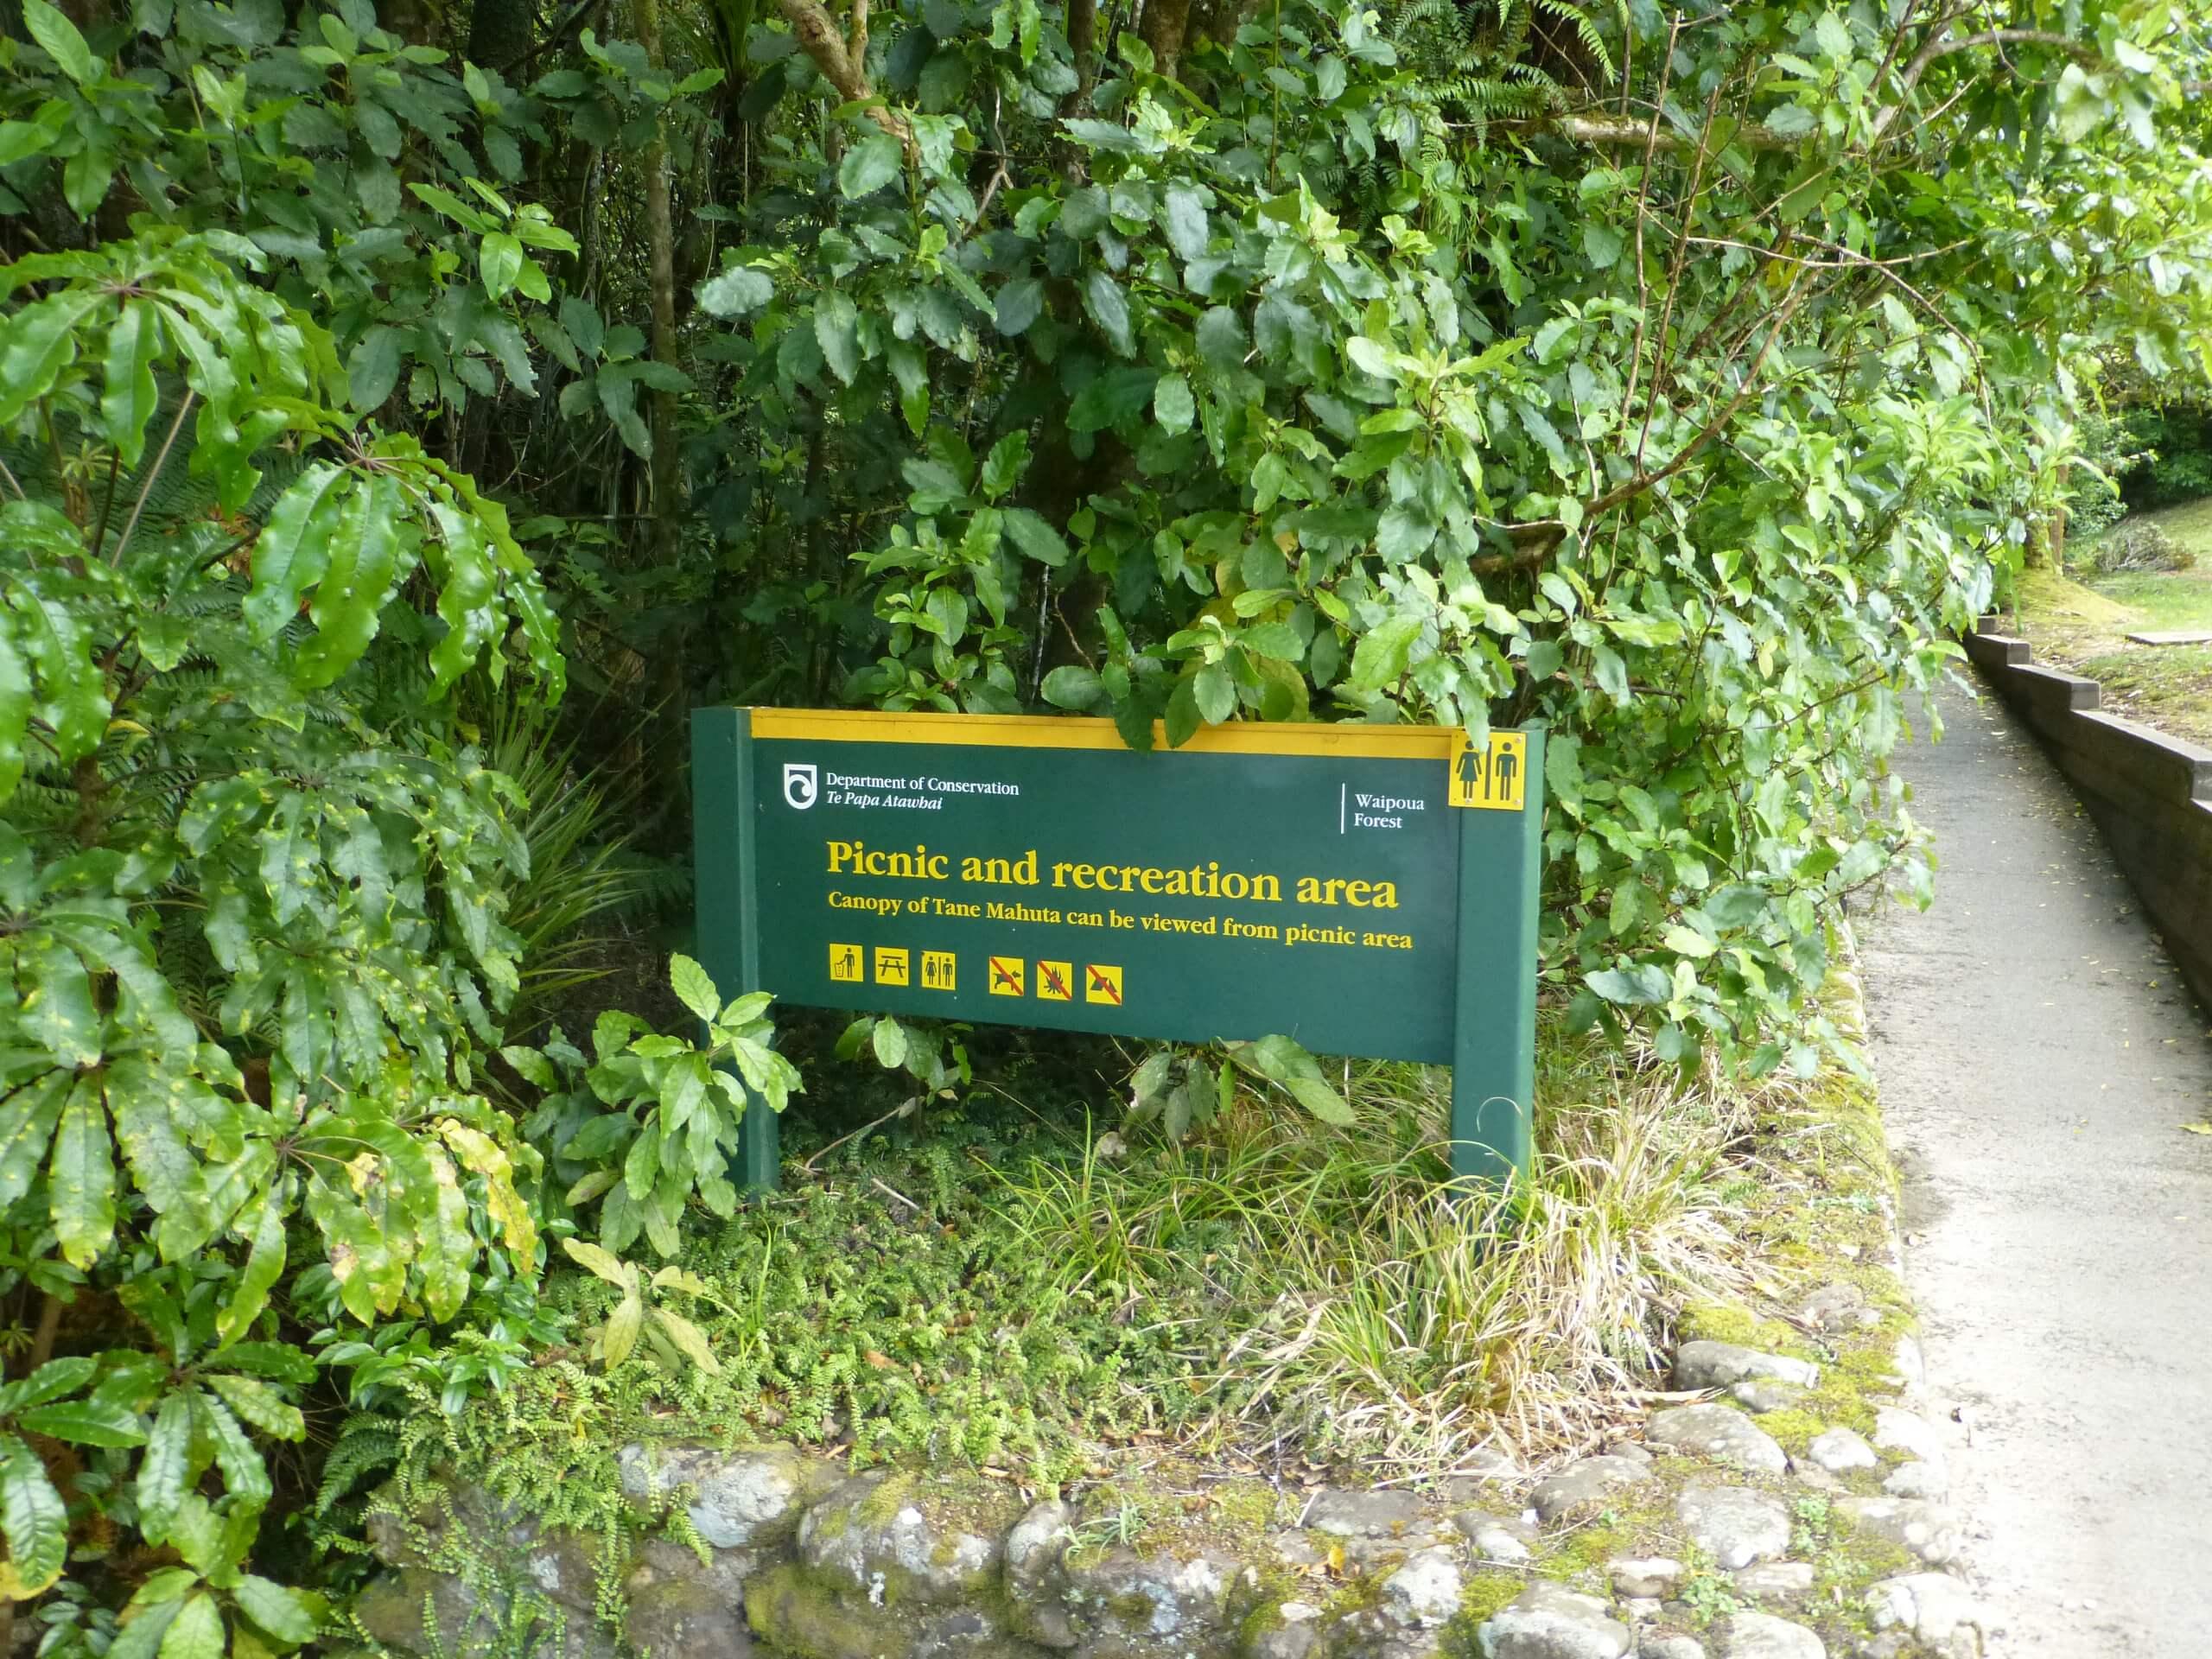 weit weg reisen, Waipoua Forest, Tane Mahuta 1